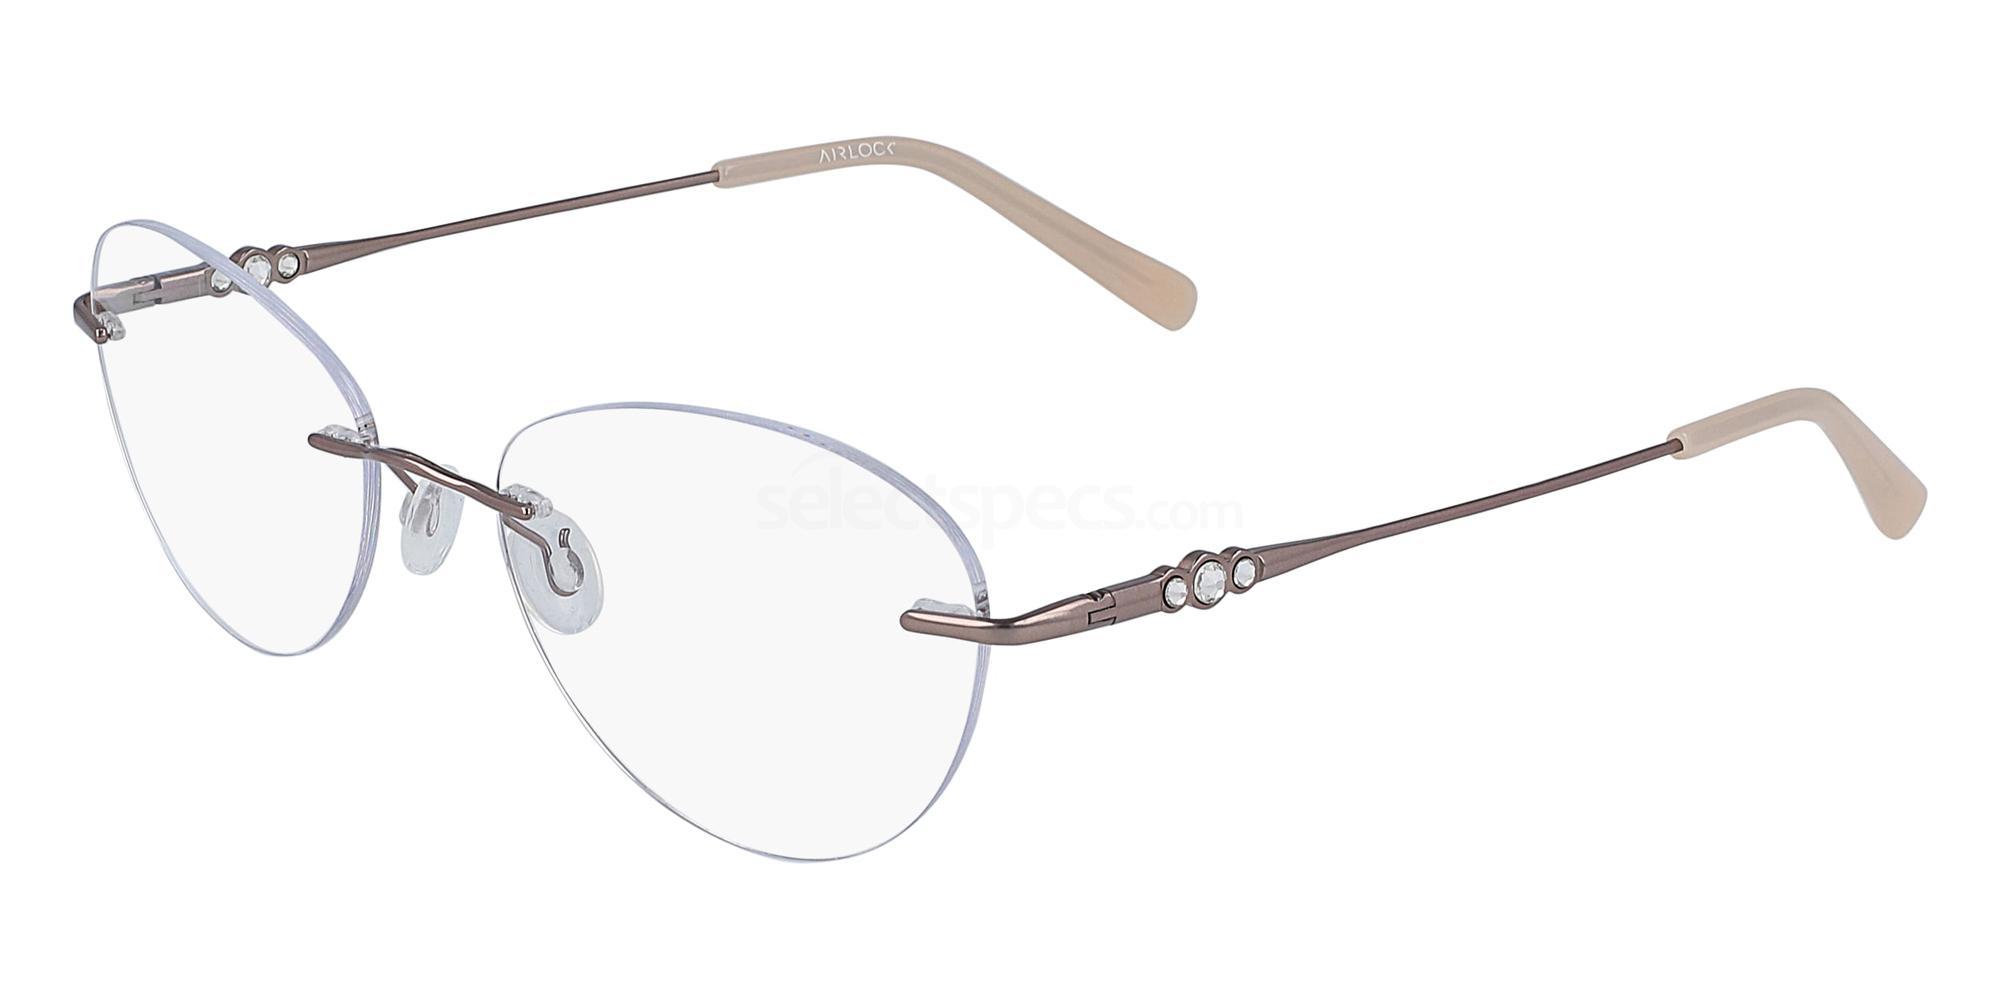 601 EMBRACE 203 Glasses, AIRLOCK